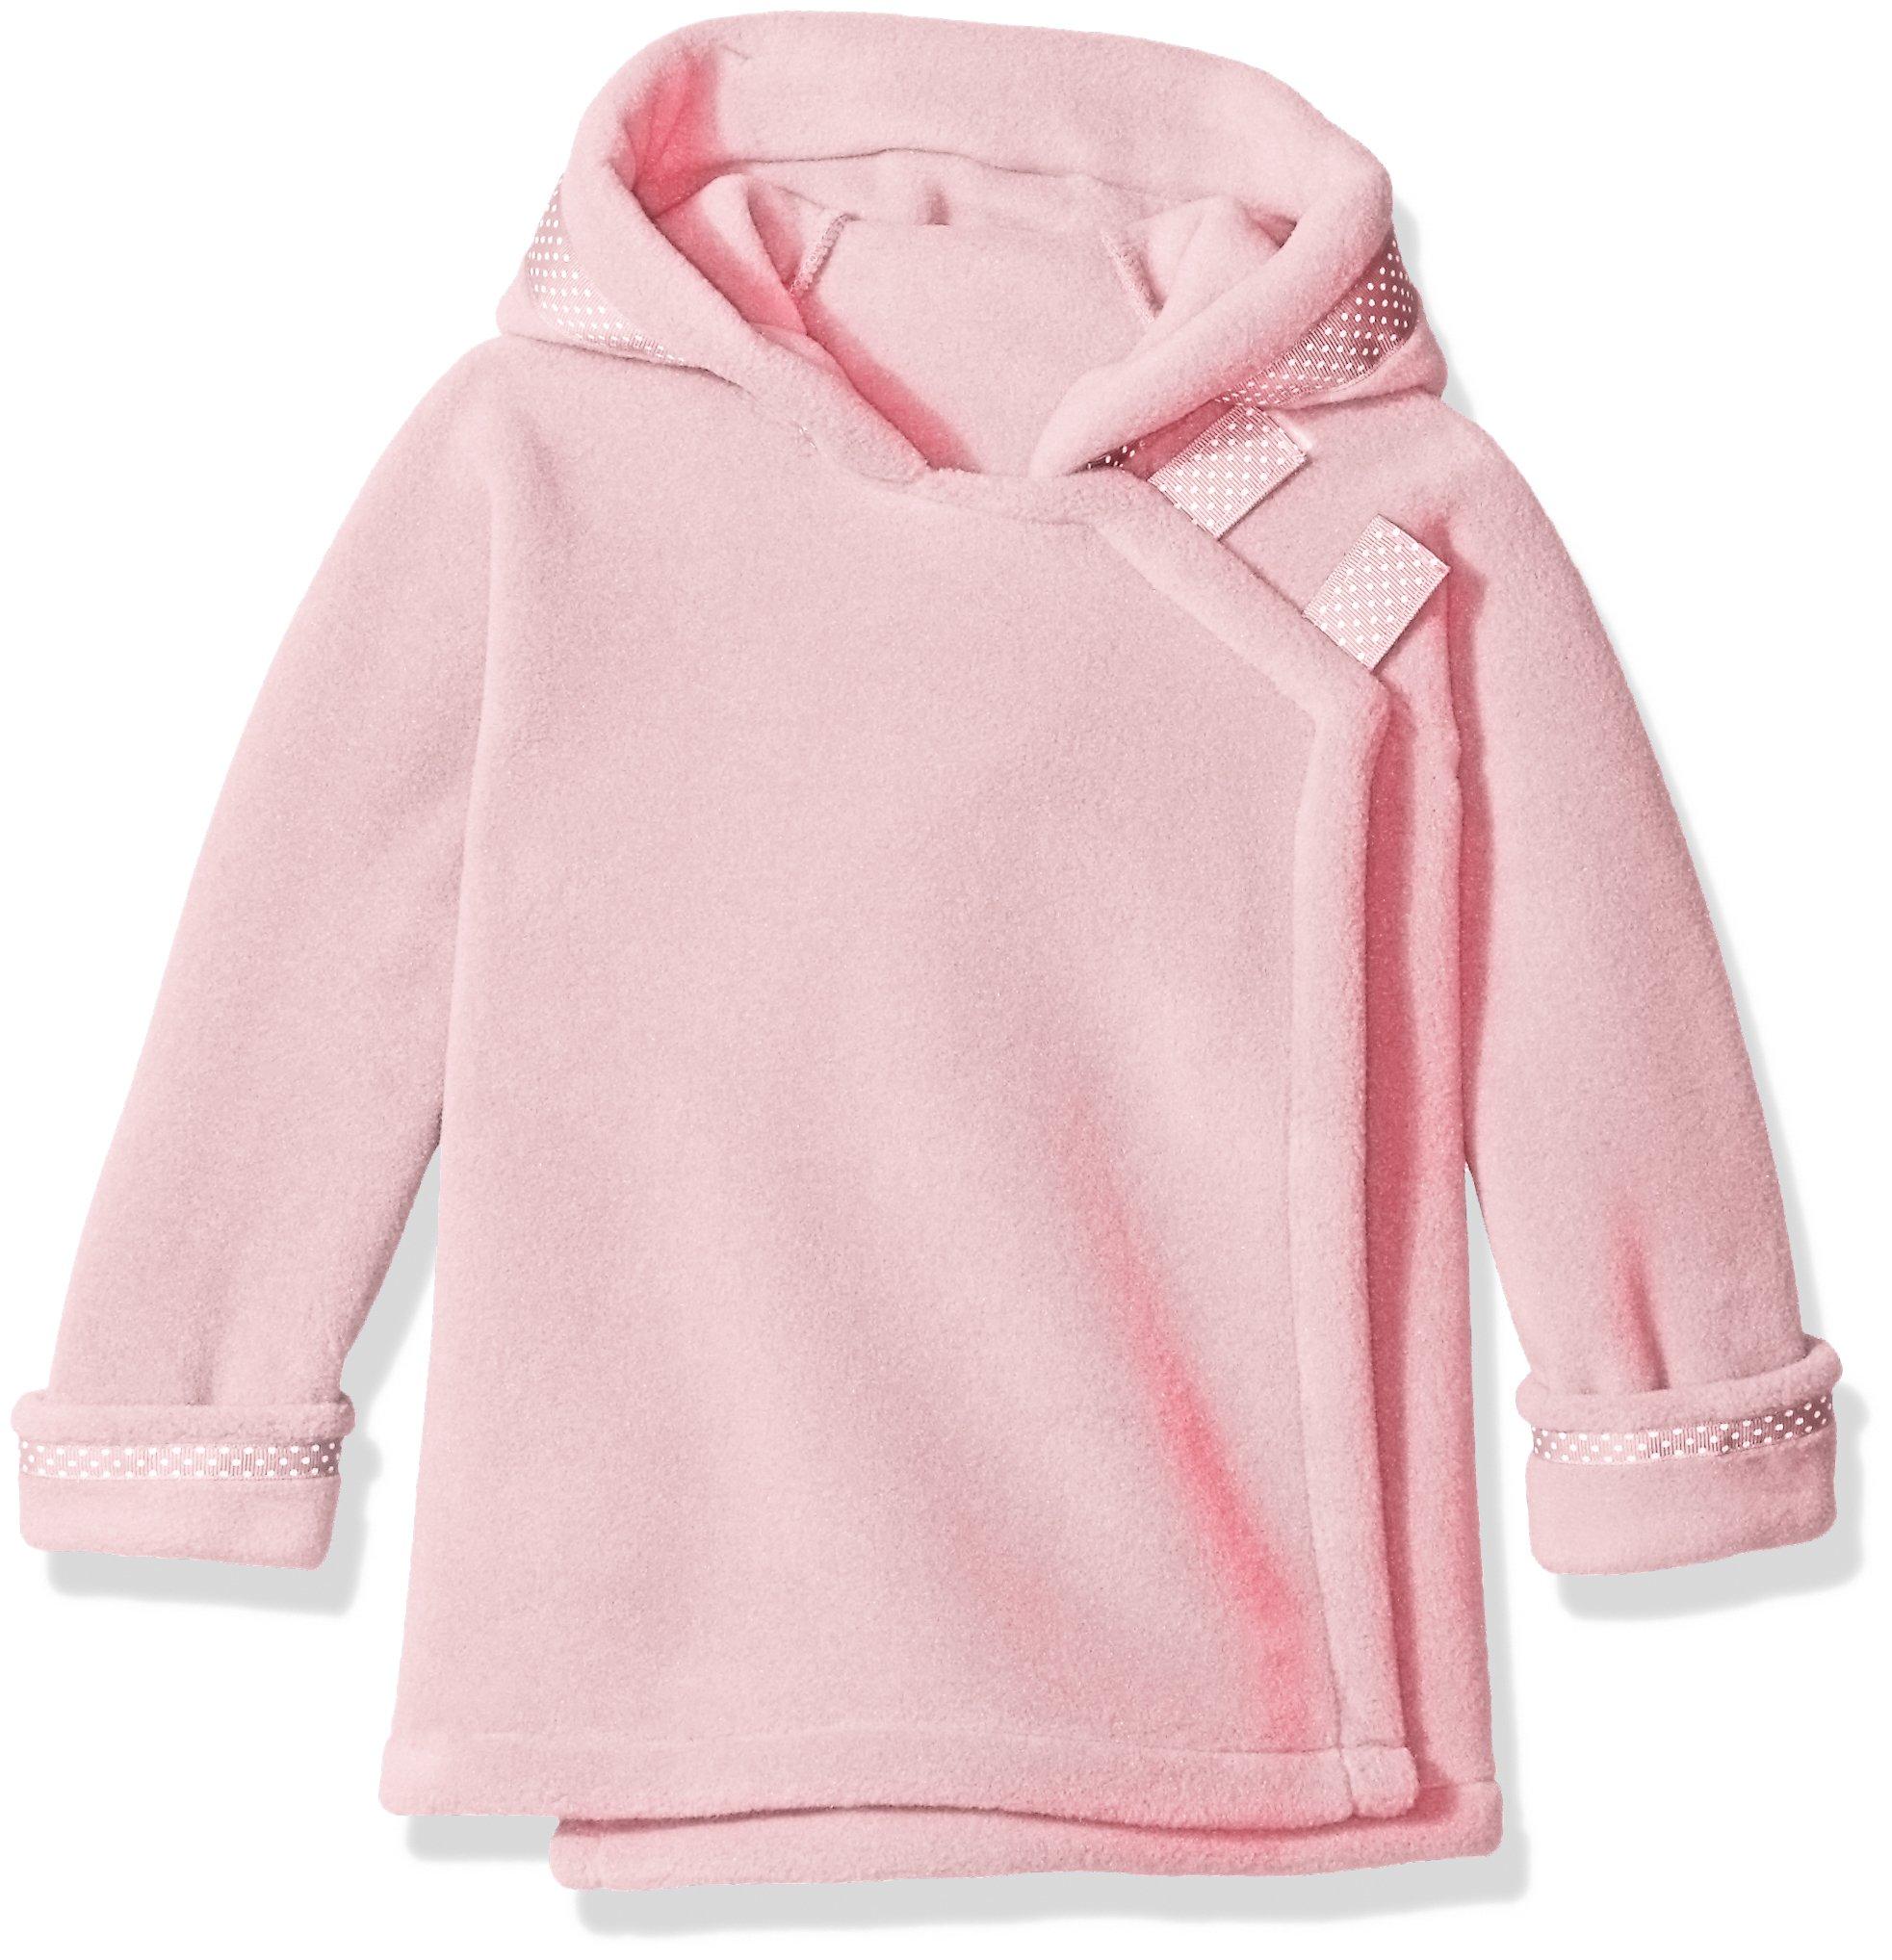 Widgeon Girls' Little Girls' Polartec Fleece Warmplus Fleece Hooded Wrap Jacket with Dot Ribbon, Light Pink, 4T